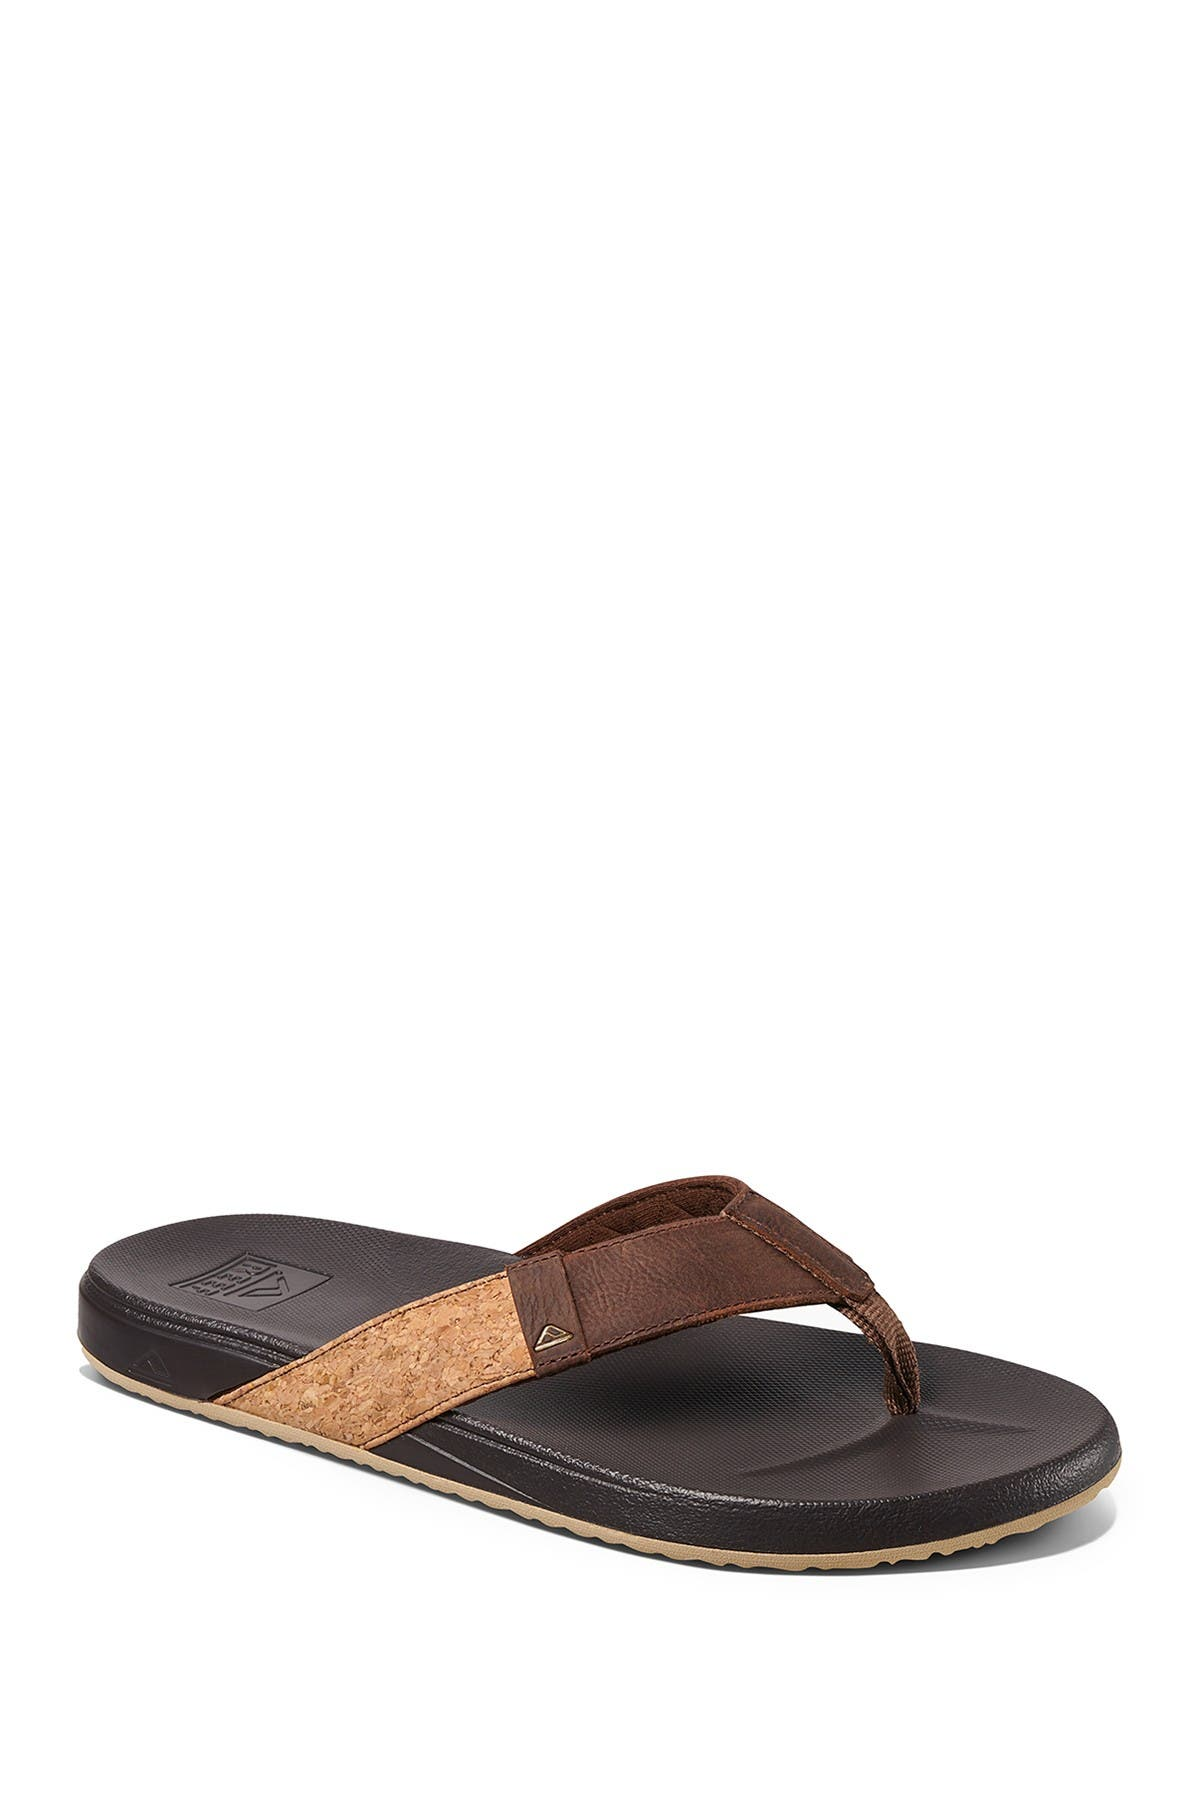 Image of Reef Custom Phantom SE Flip Flop Sandal